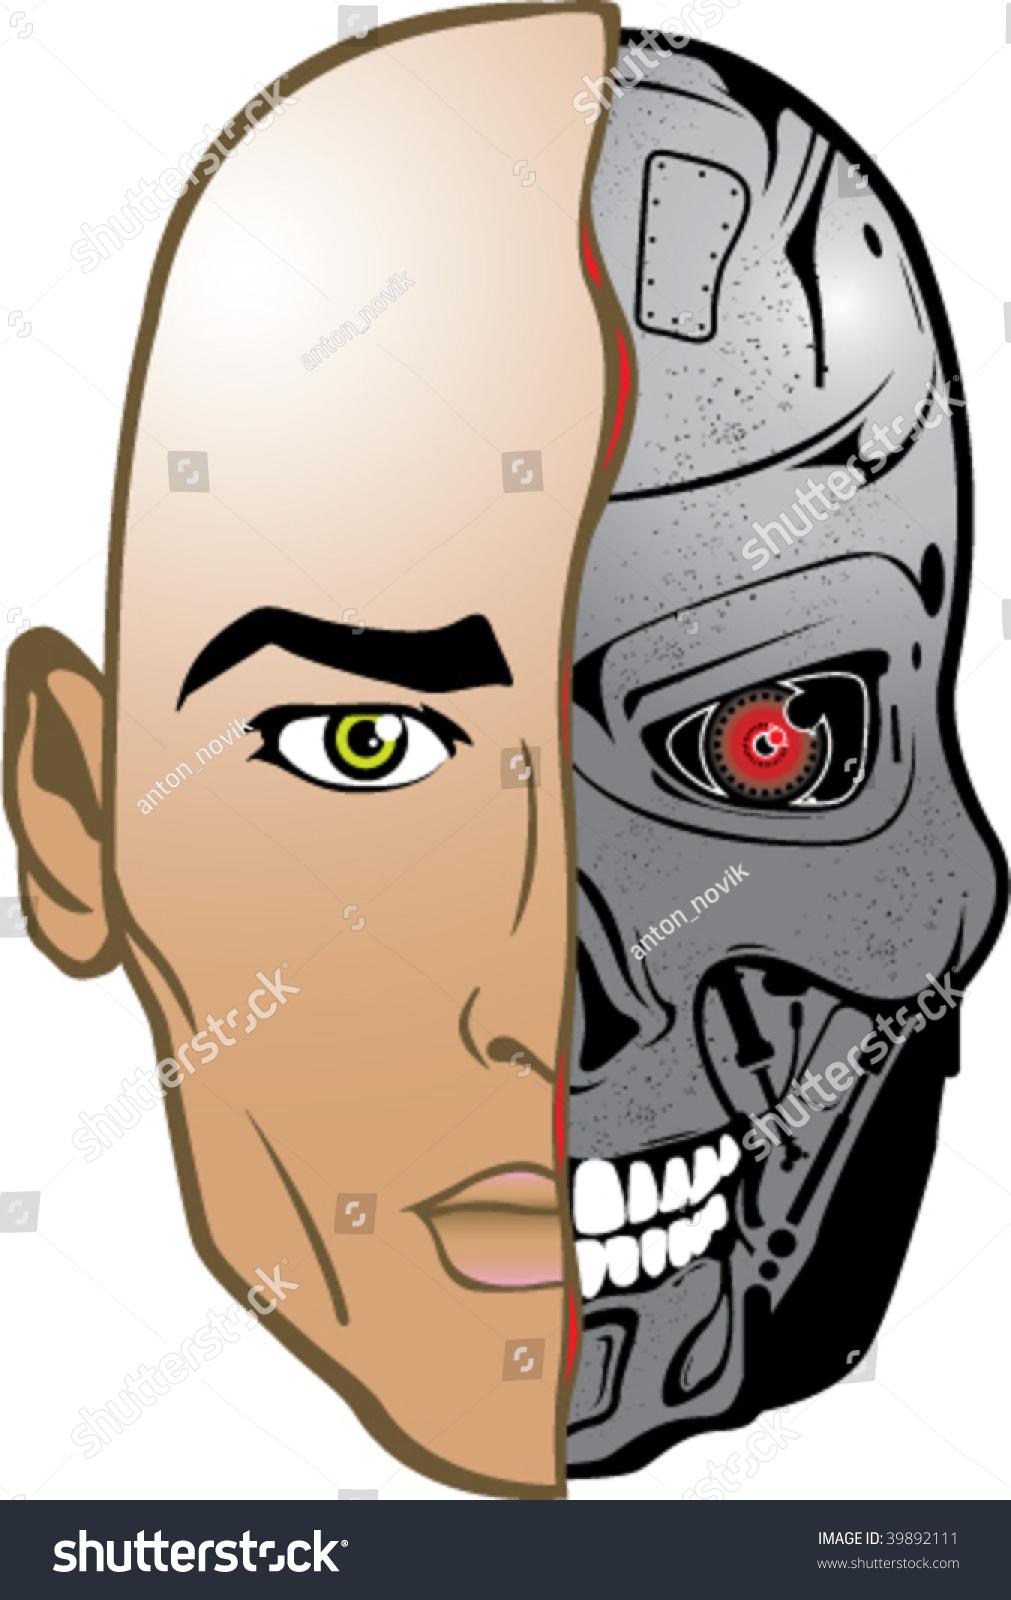 e4b6d279d1604 Color Robot Half human. Vector Humanoid Face. Royalty Free Stock ...